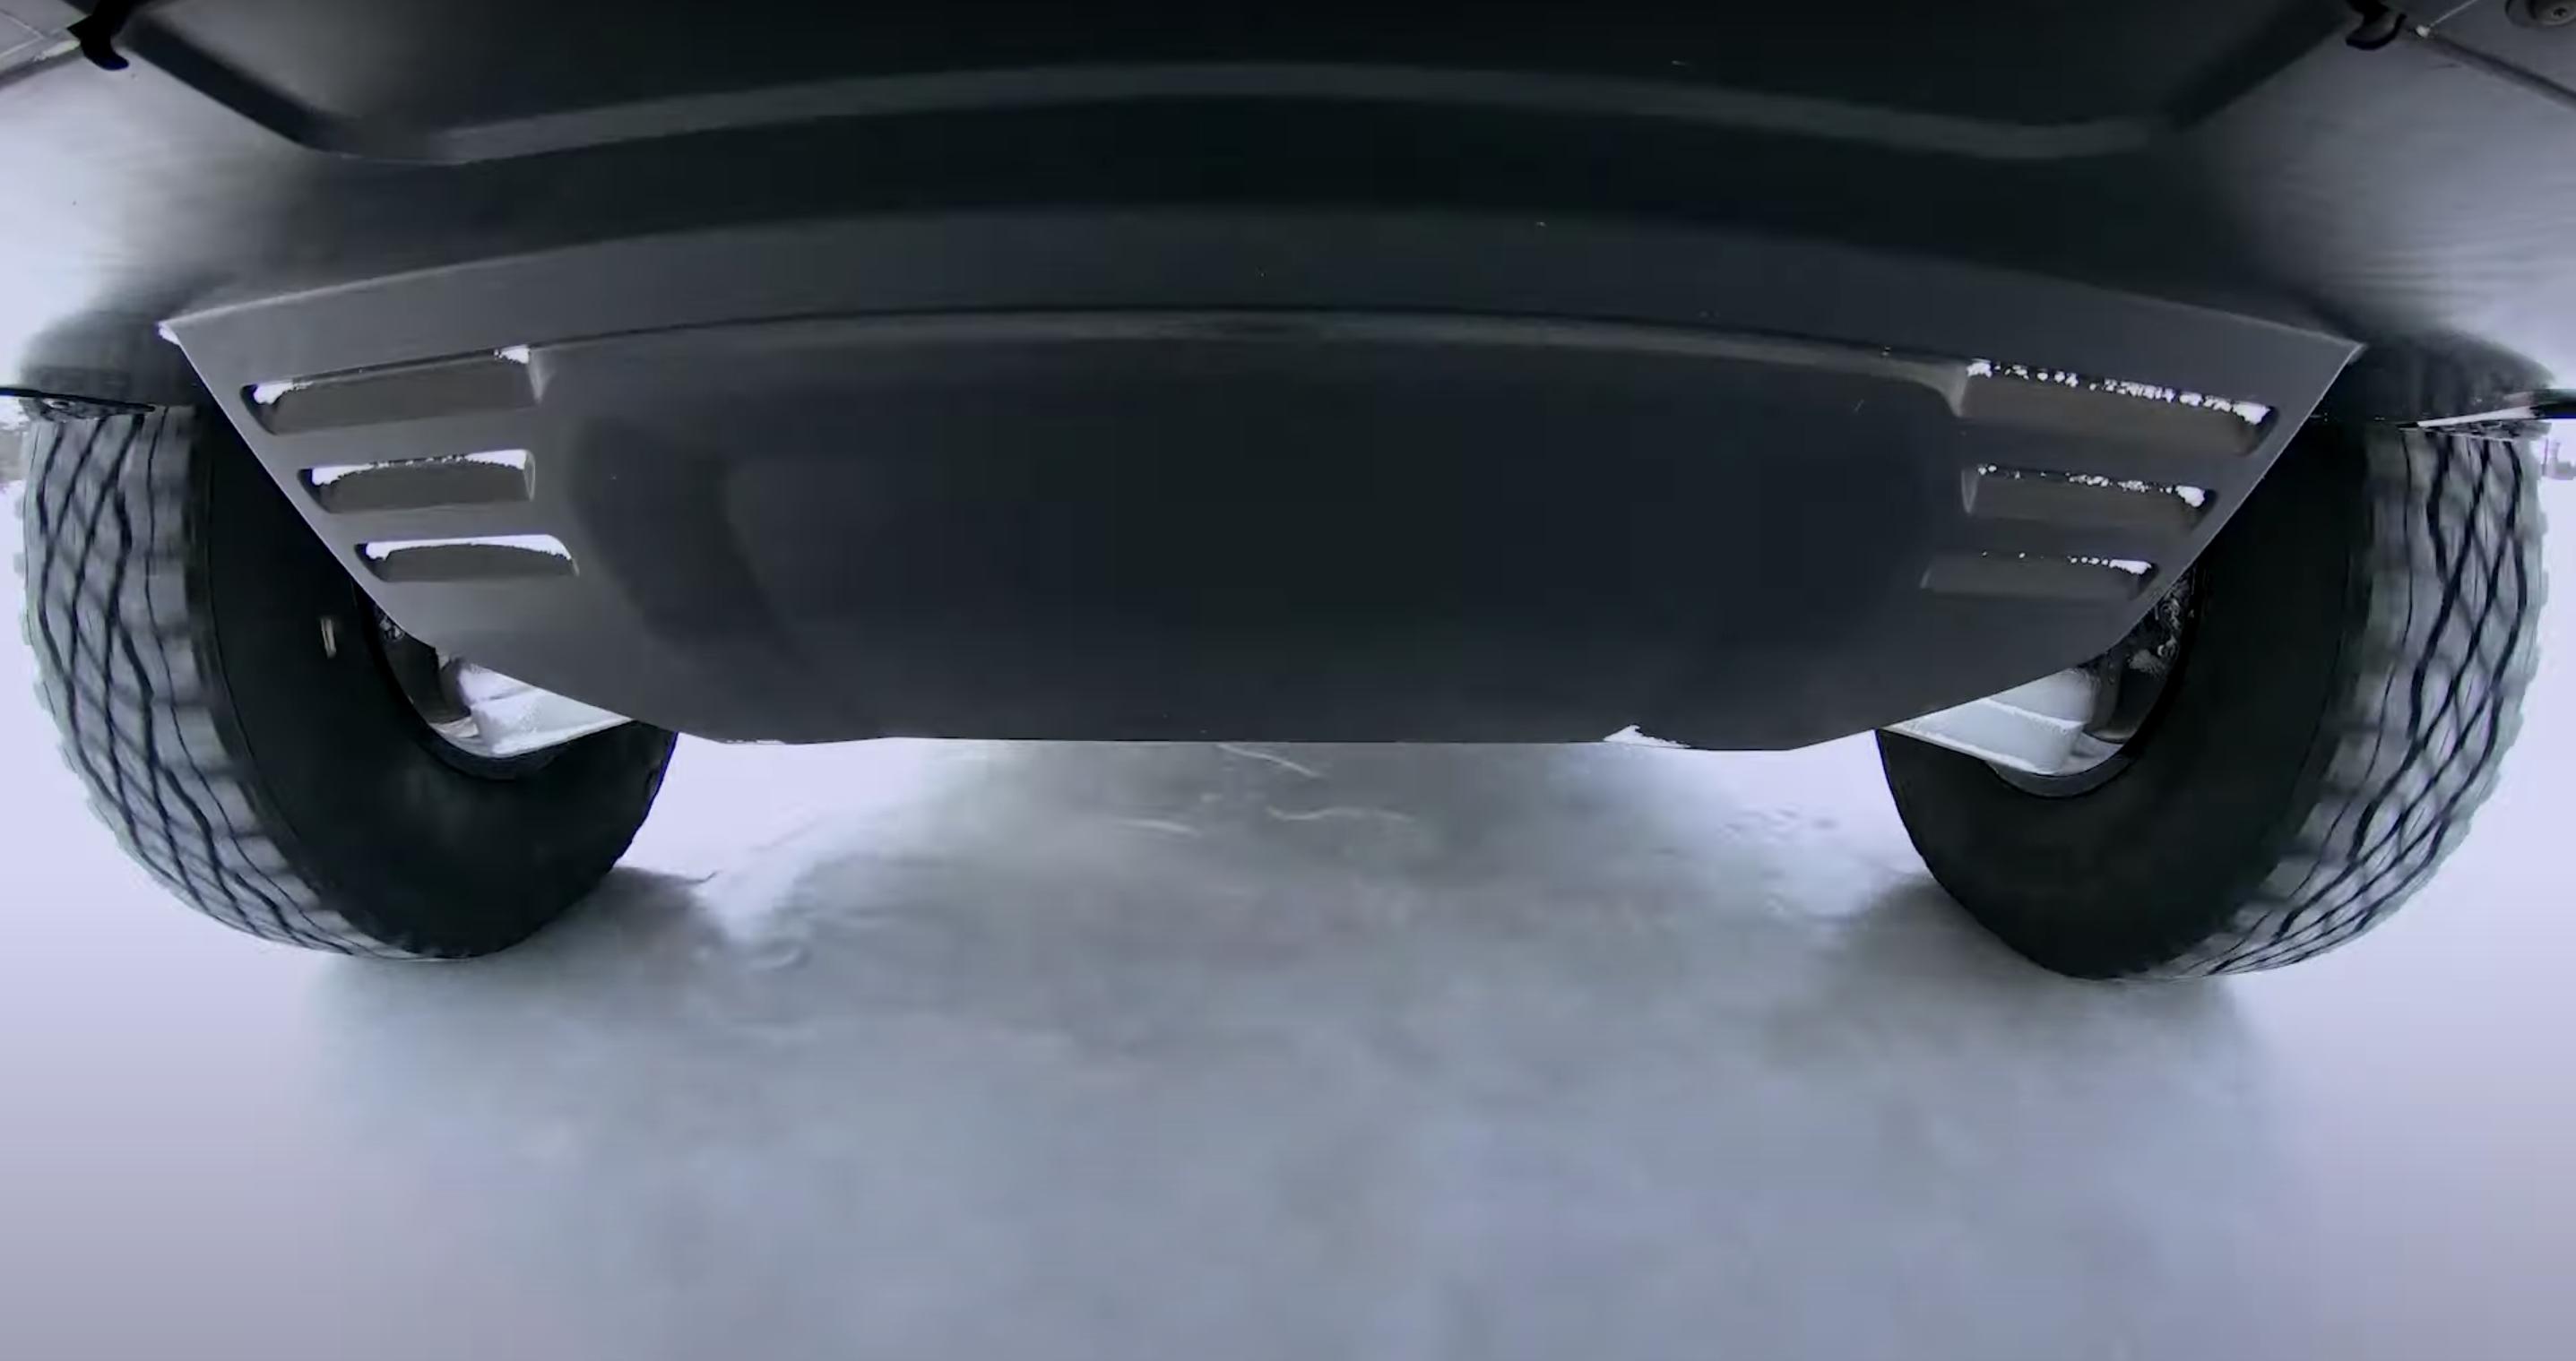 Hummer EV pickup winter testing underbody